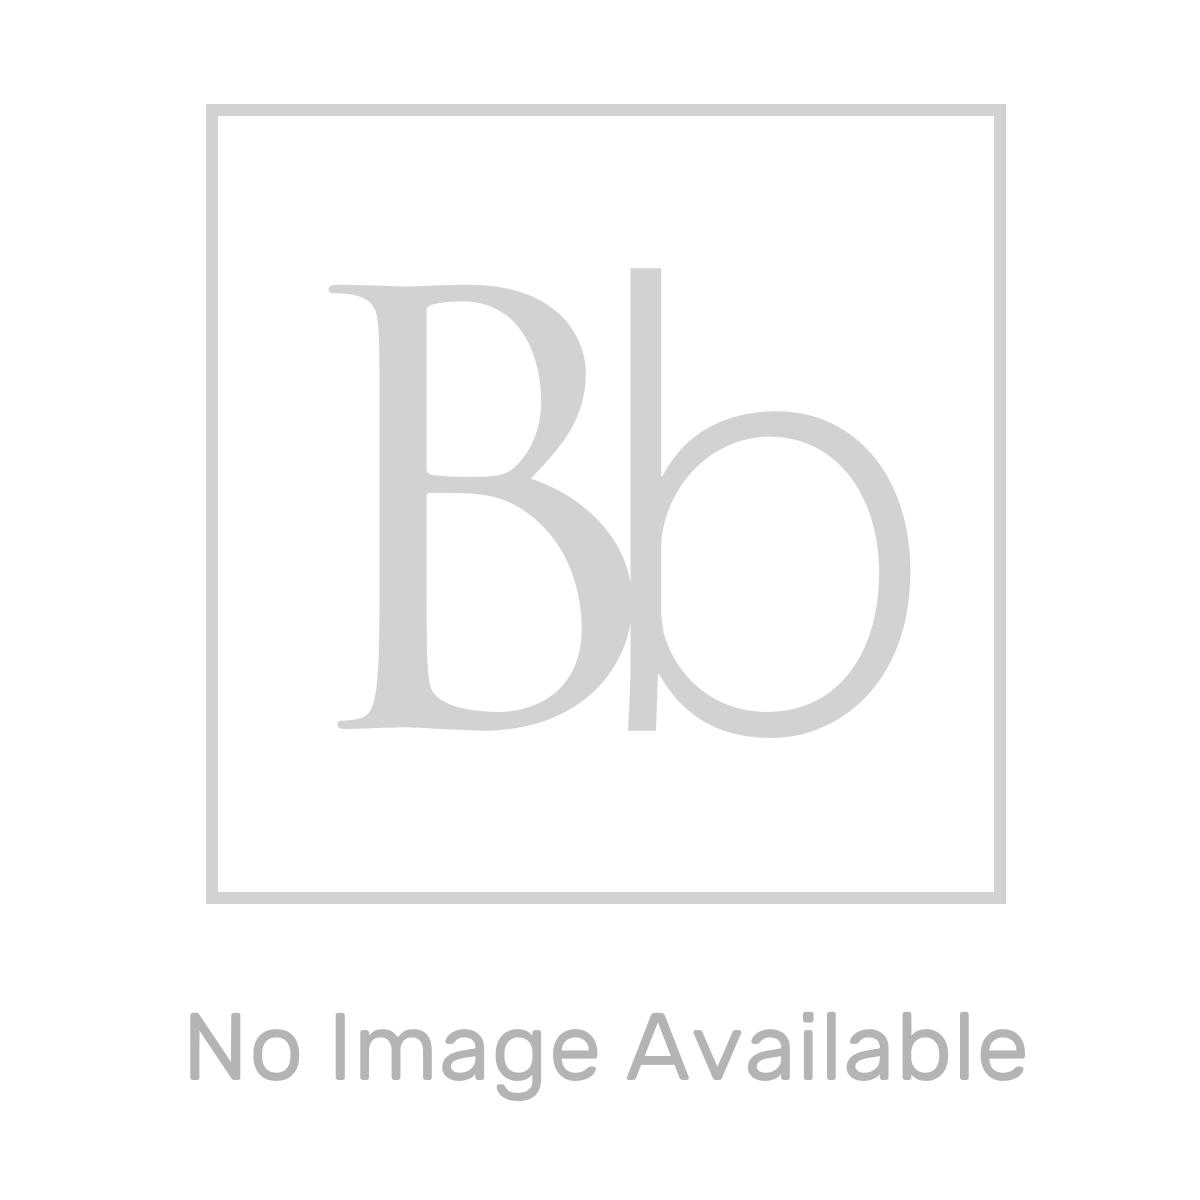 RAK Feeling Greige Rectangular Shower Tray 1700 x 700mm Measurements